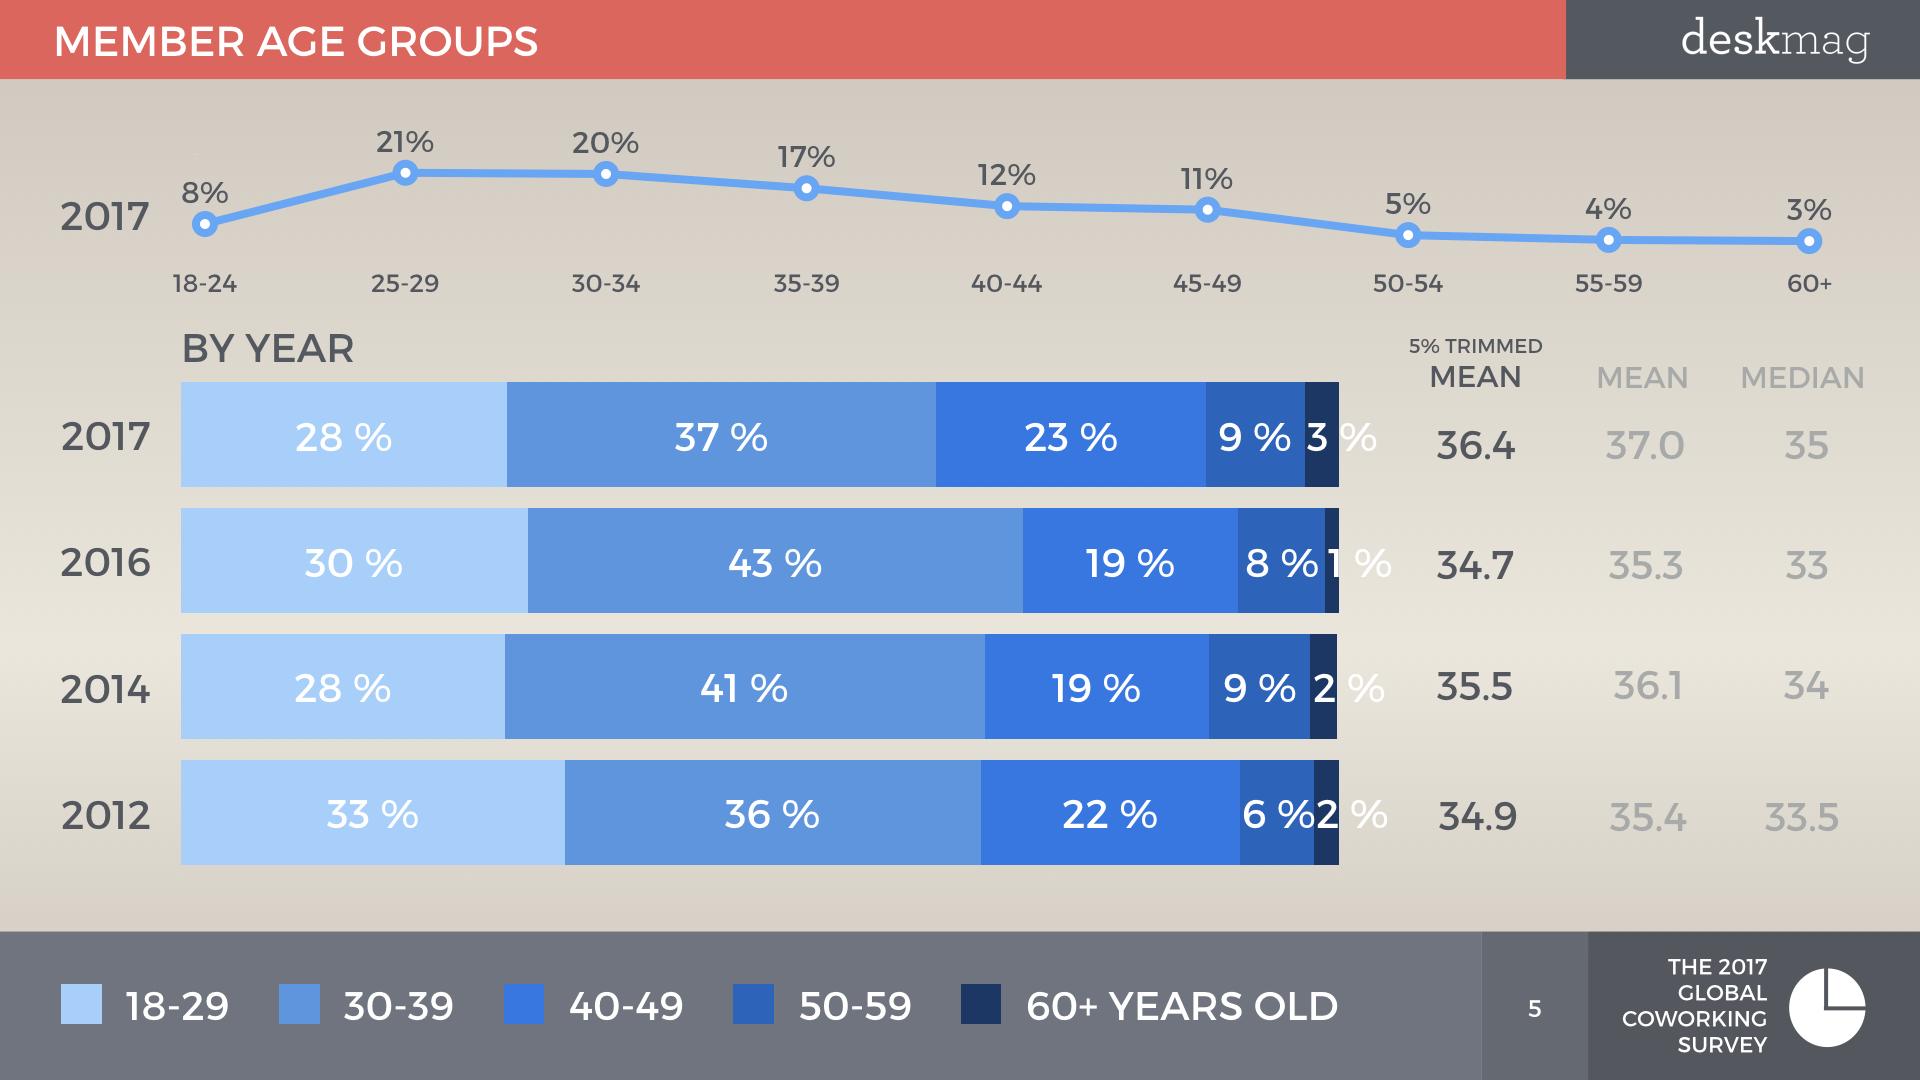 Members Of Coworking Spaces - Global Coworking Survey 2017 All Slides DEMOGRAPHICS.005.jpeg